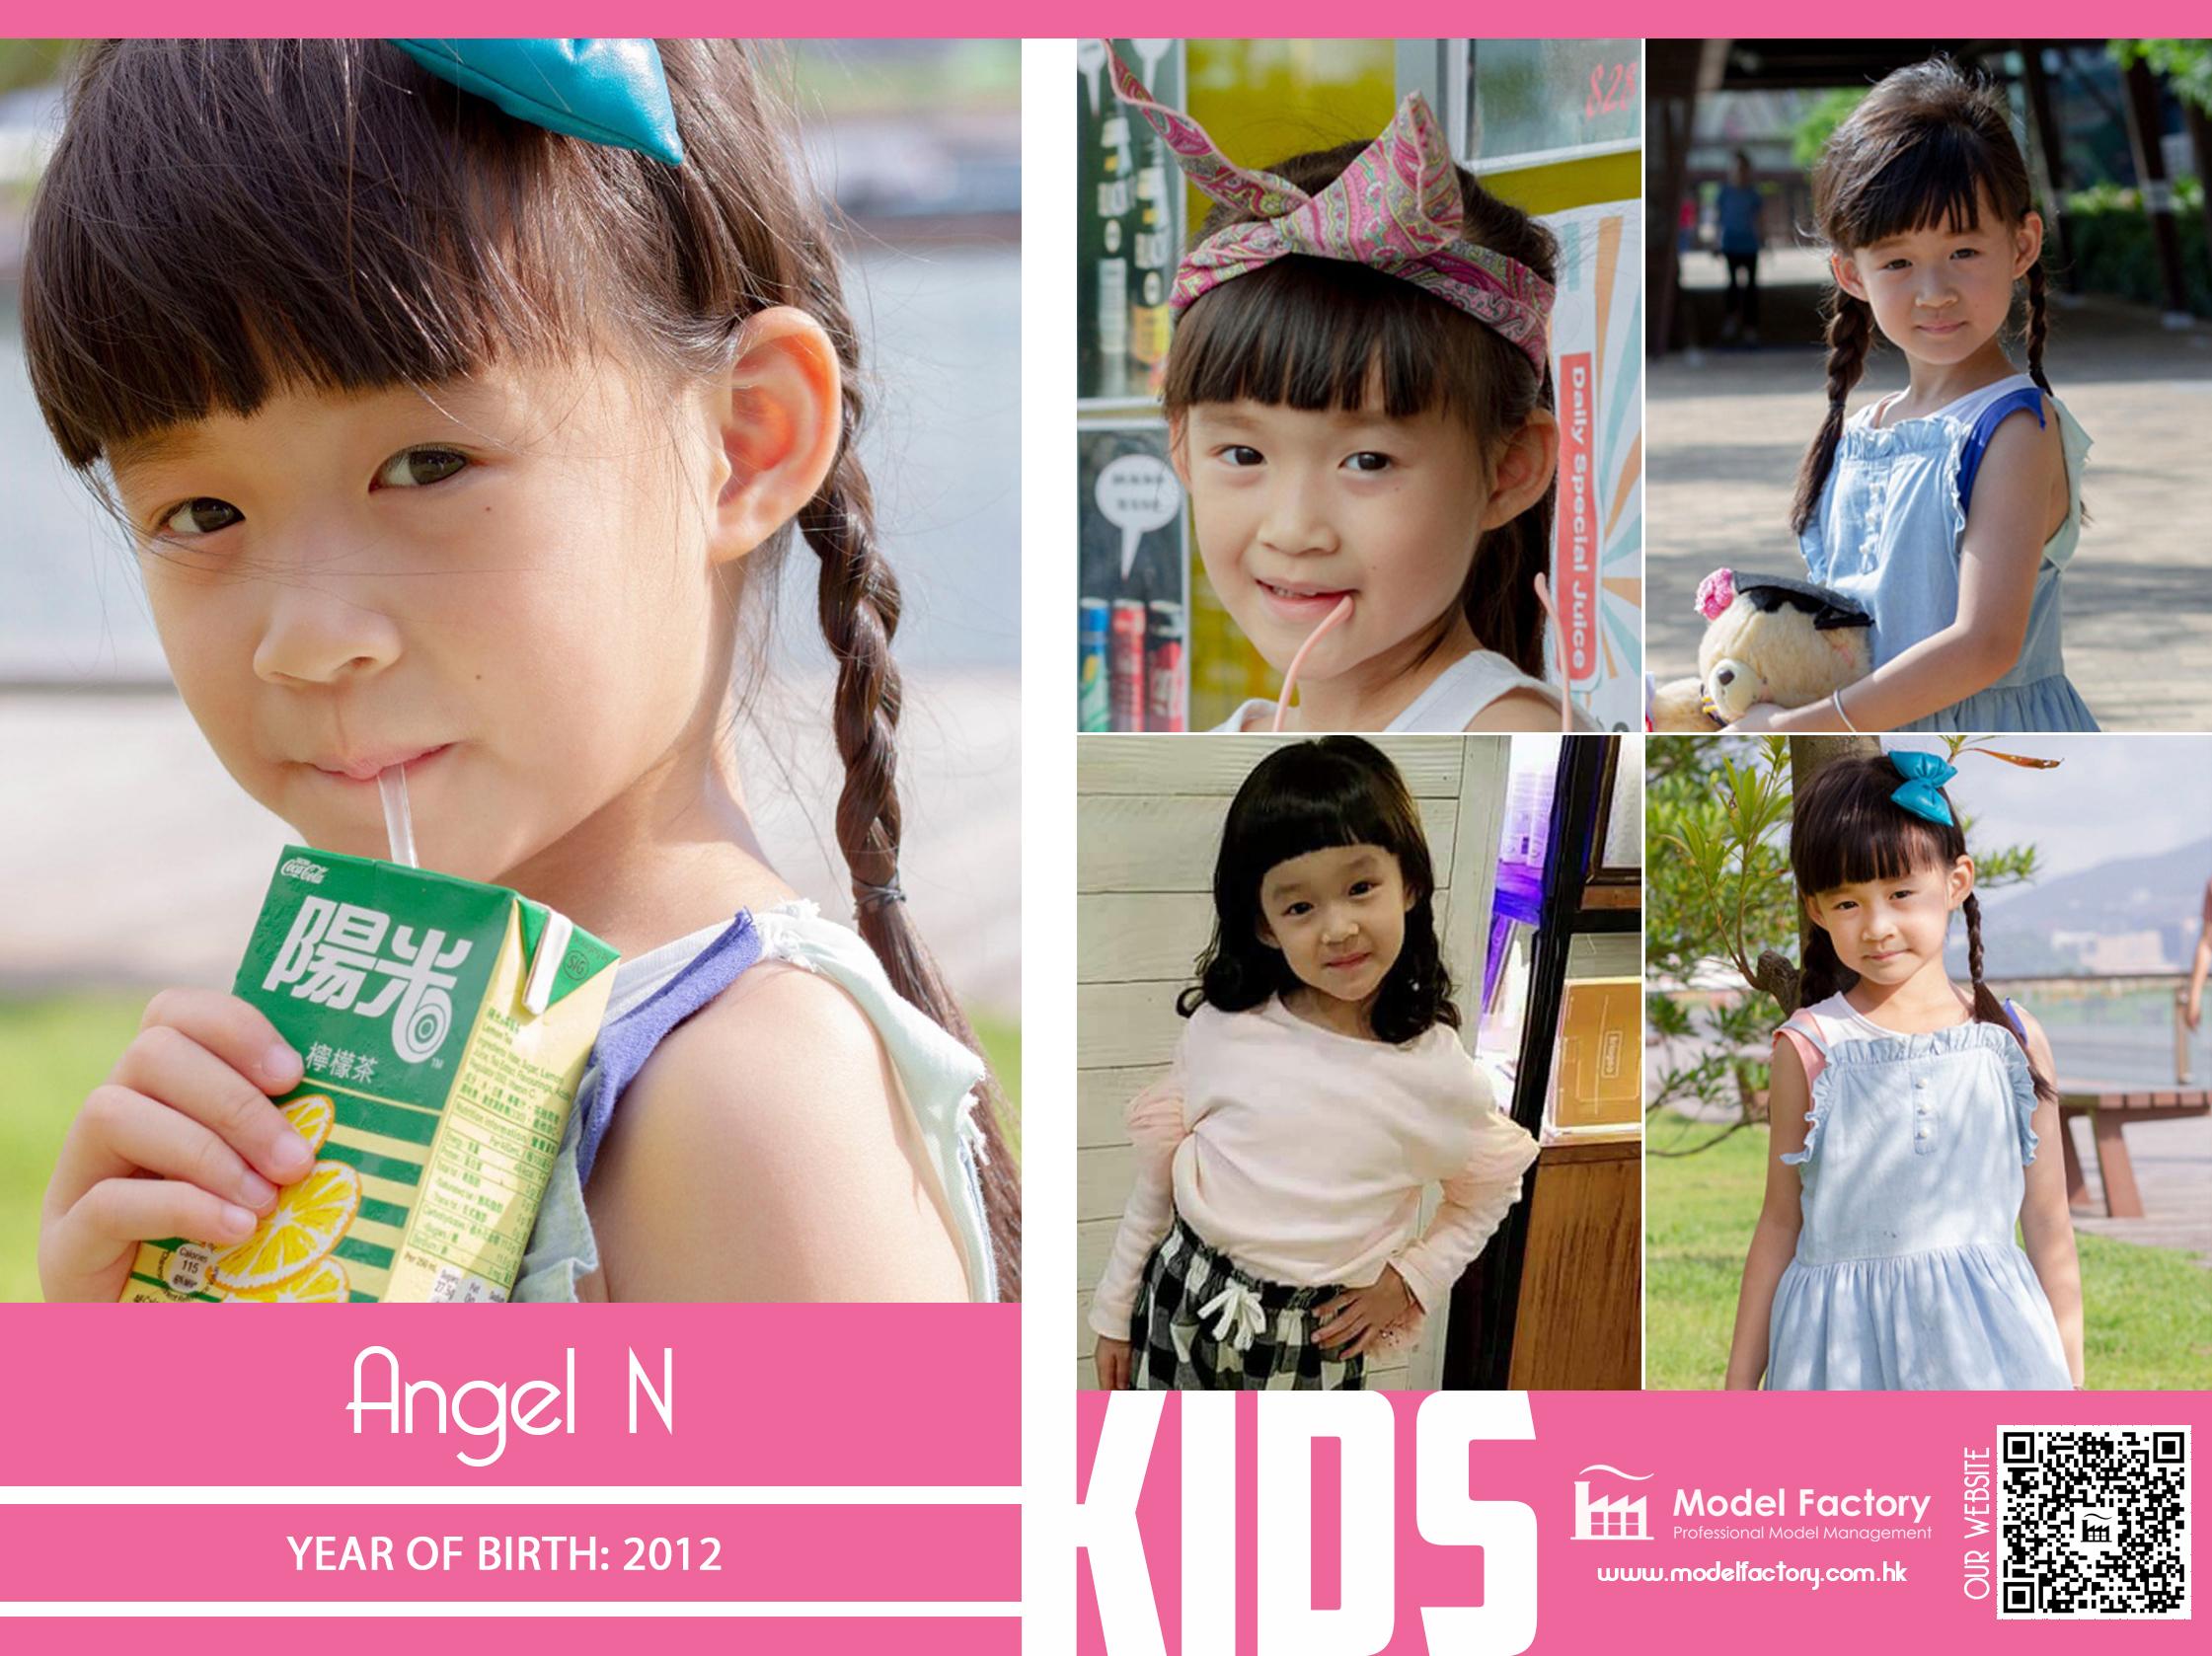 Model Factory Local Kids Model Angel N